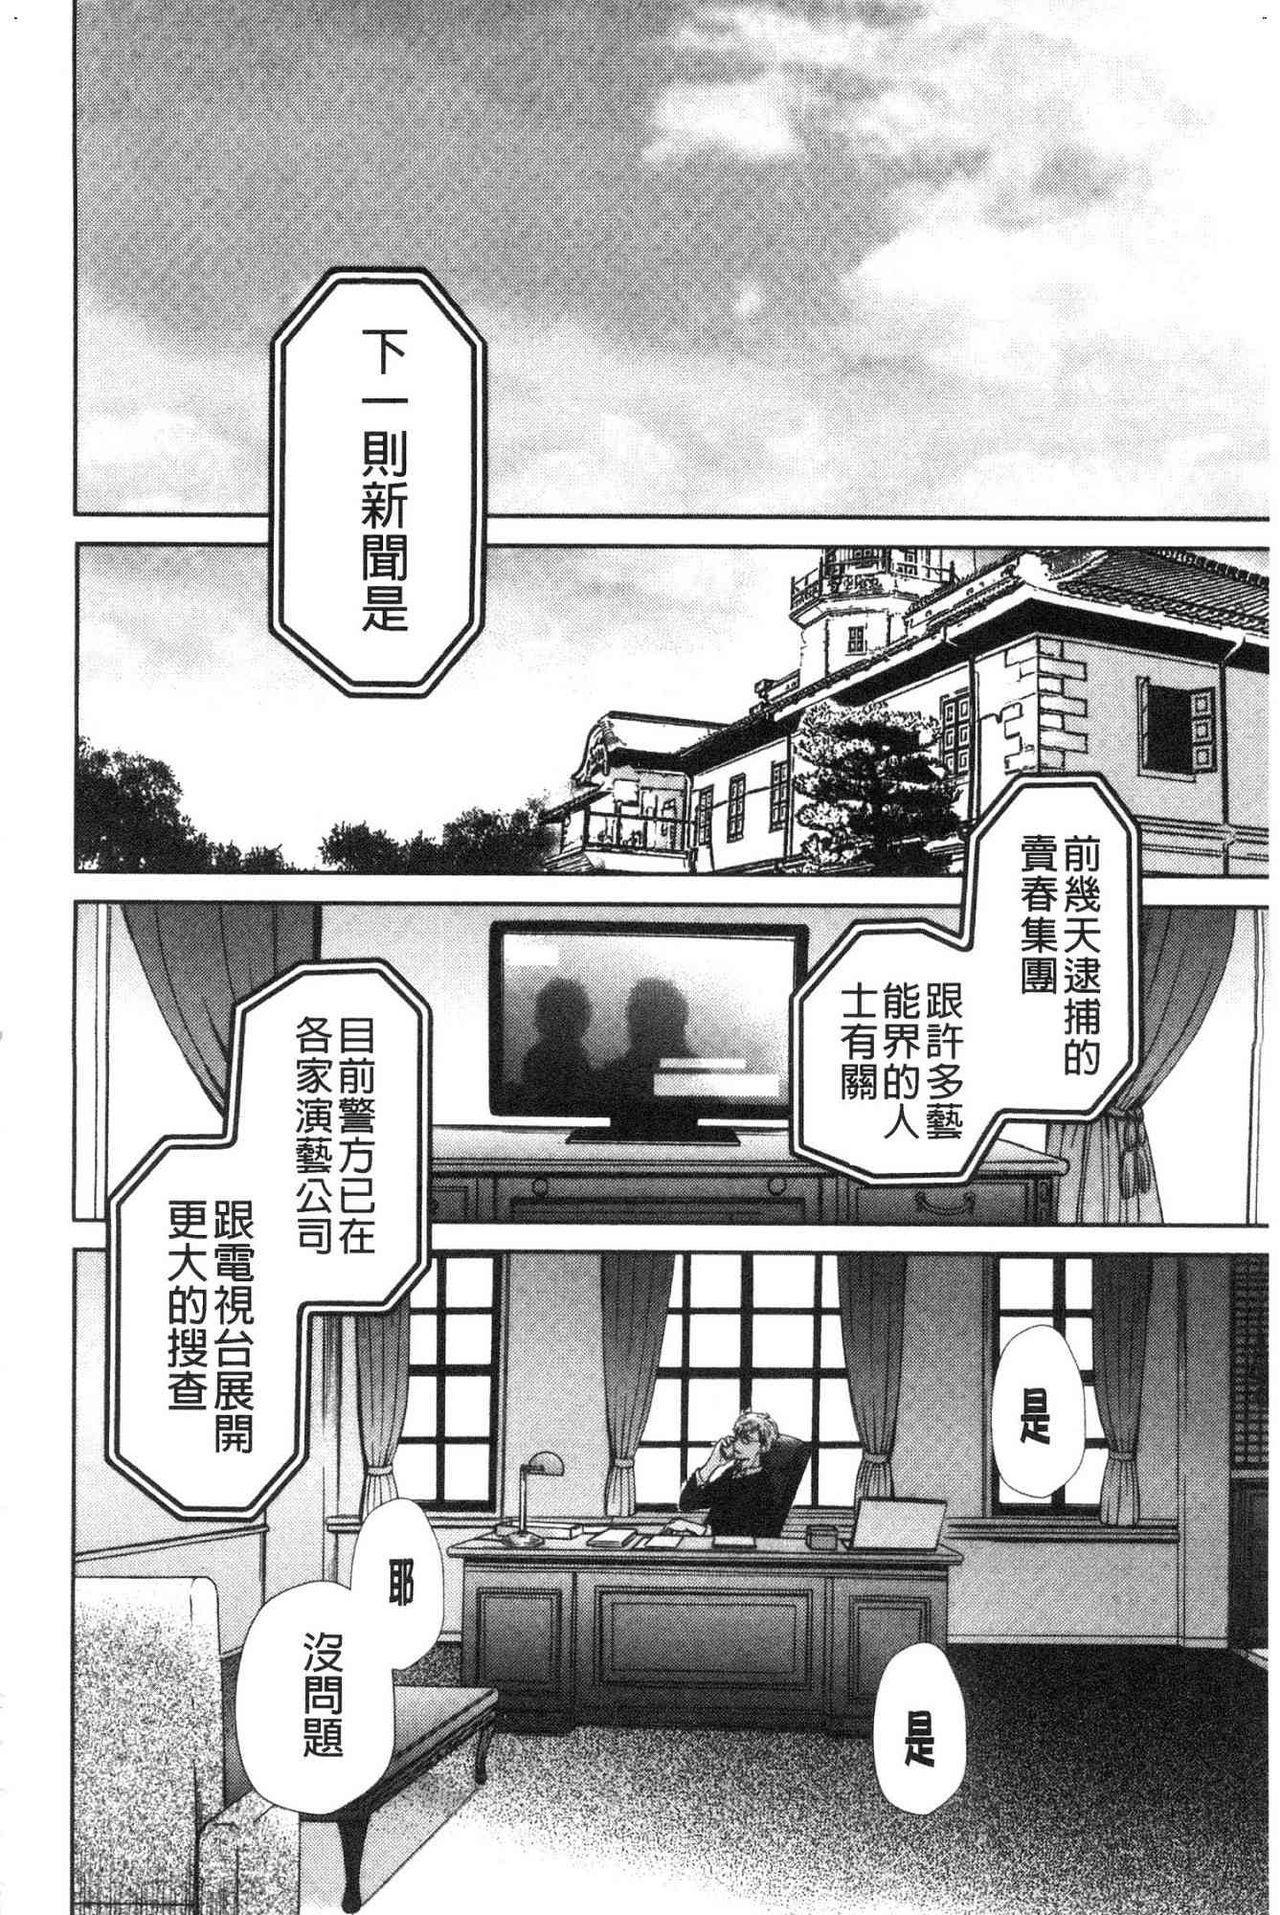 [Gotoh Akira]  21-ji no Onna ~Camera no Mae no Mesuinu~ 2 | 21時之女 ~鏡頭前的牝犬~ 2 [Chinese] 201